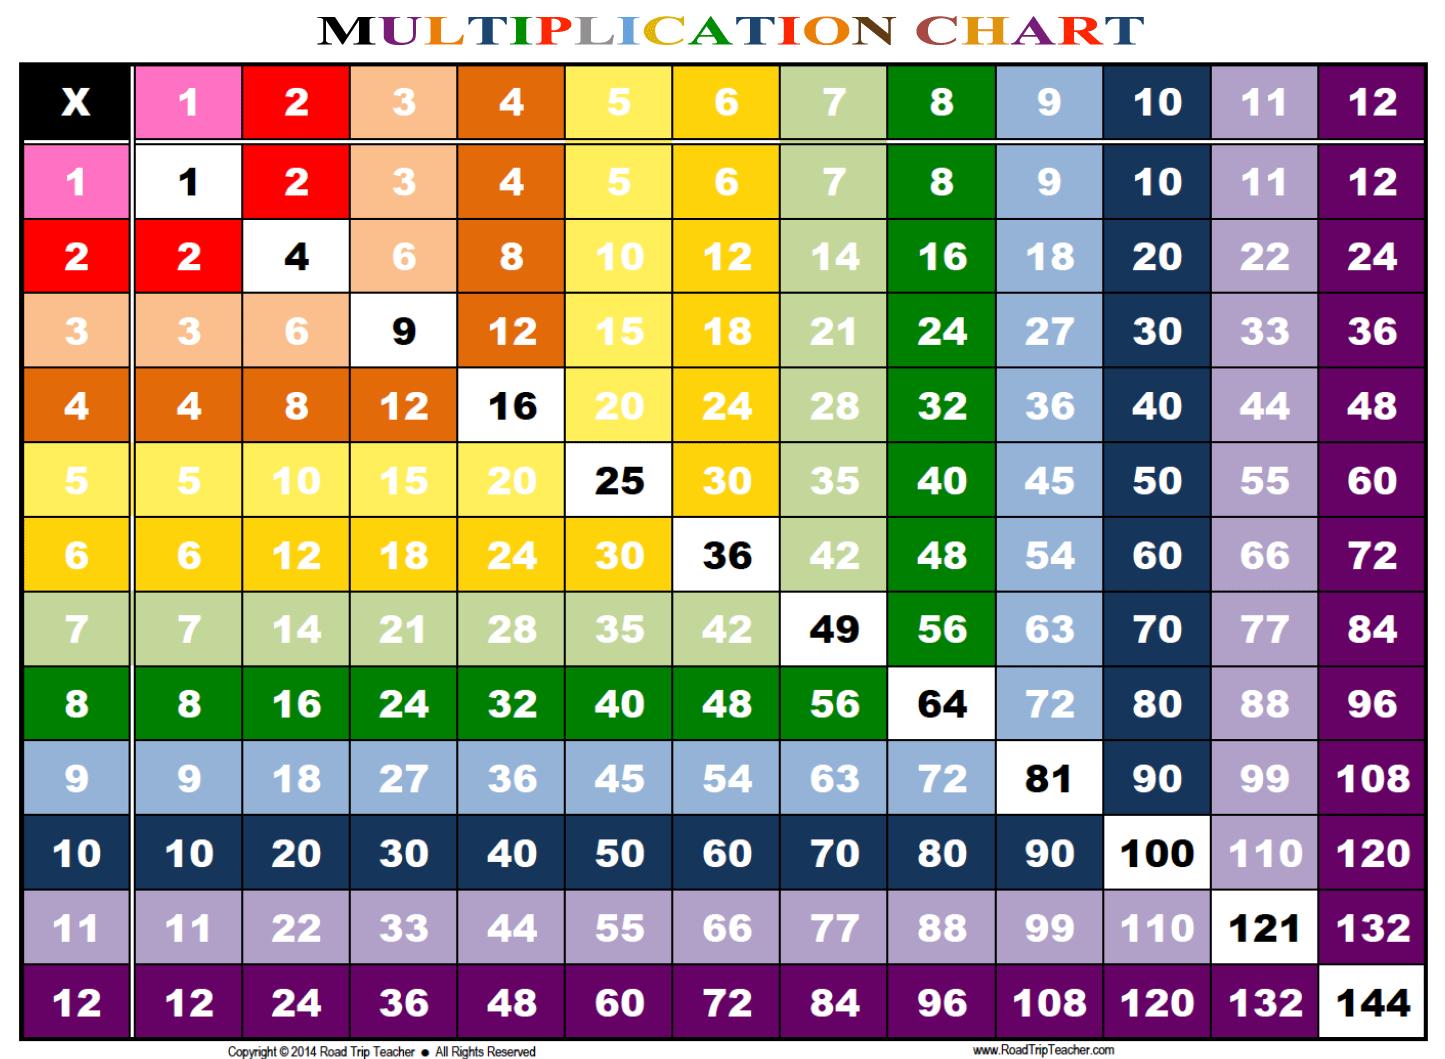 Multiplication Tables Worksheet Printable Printable Calendar Posters Images Wallpapers Free